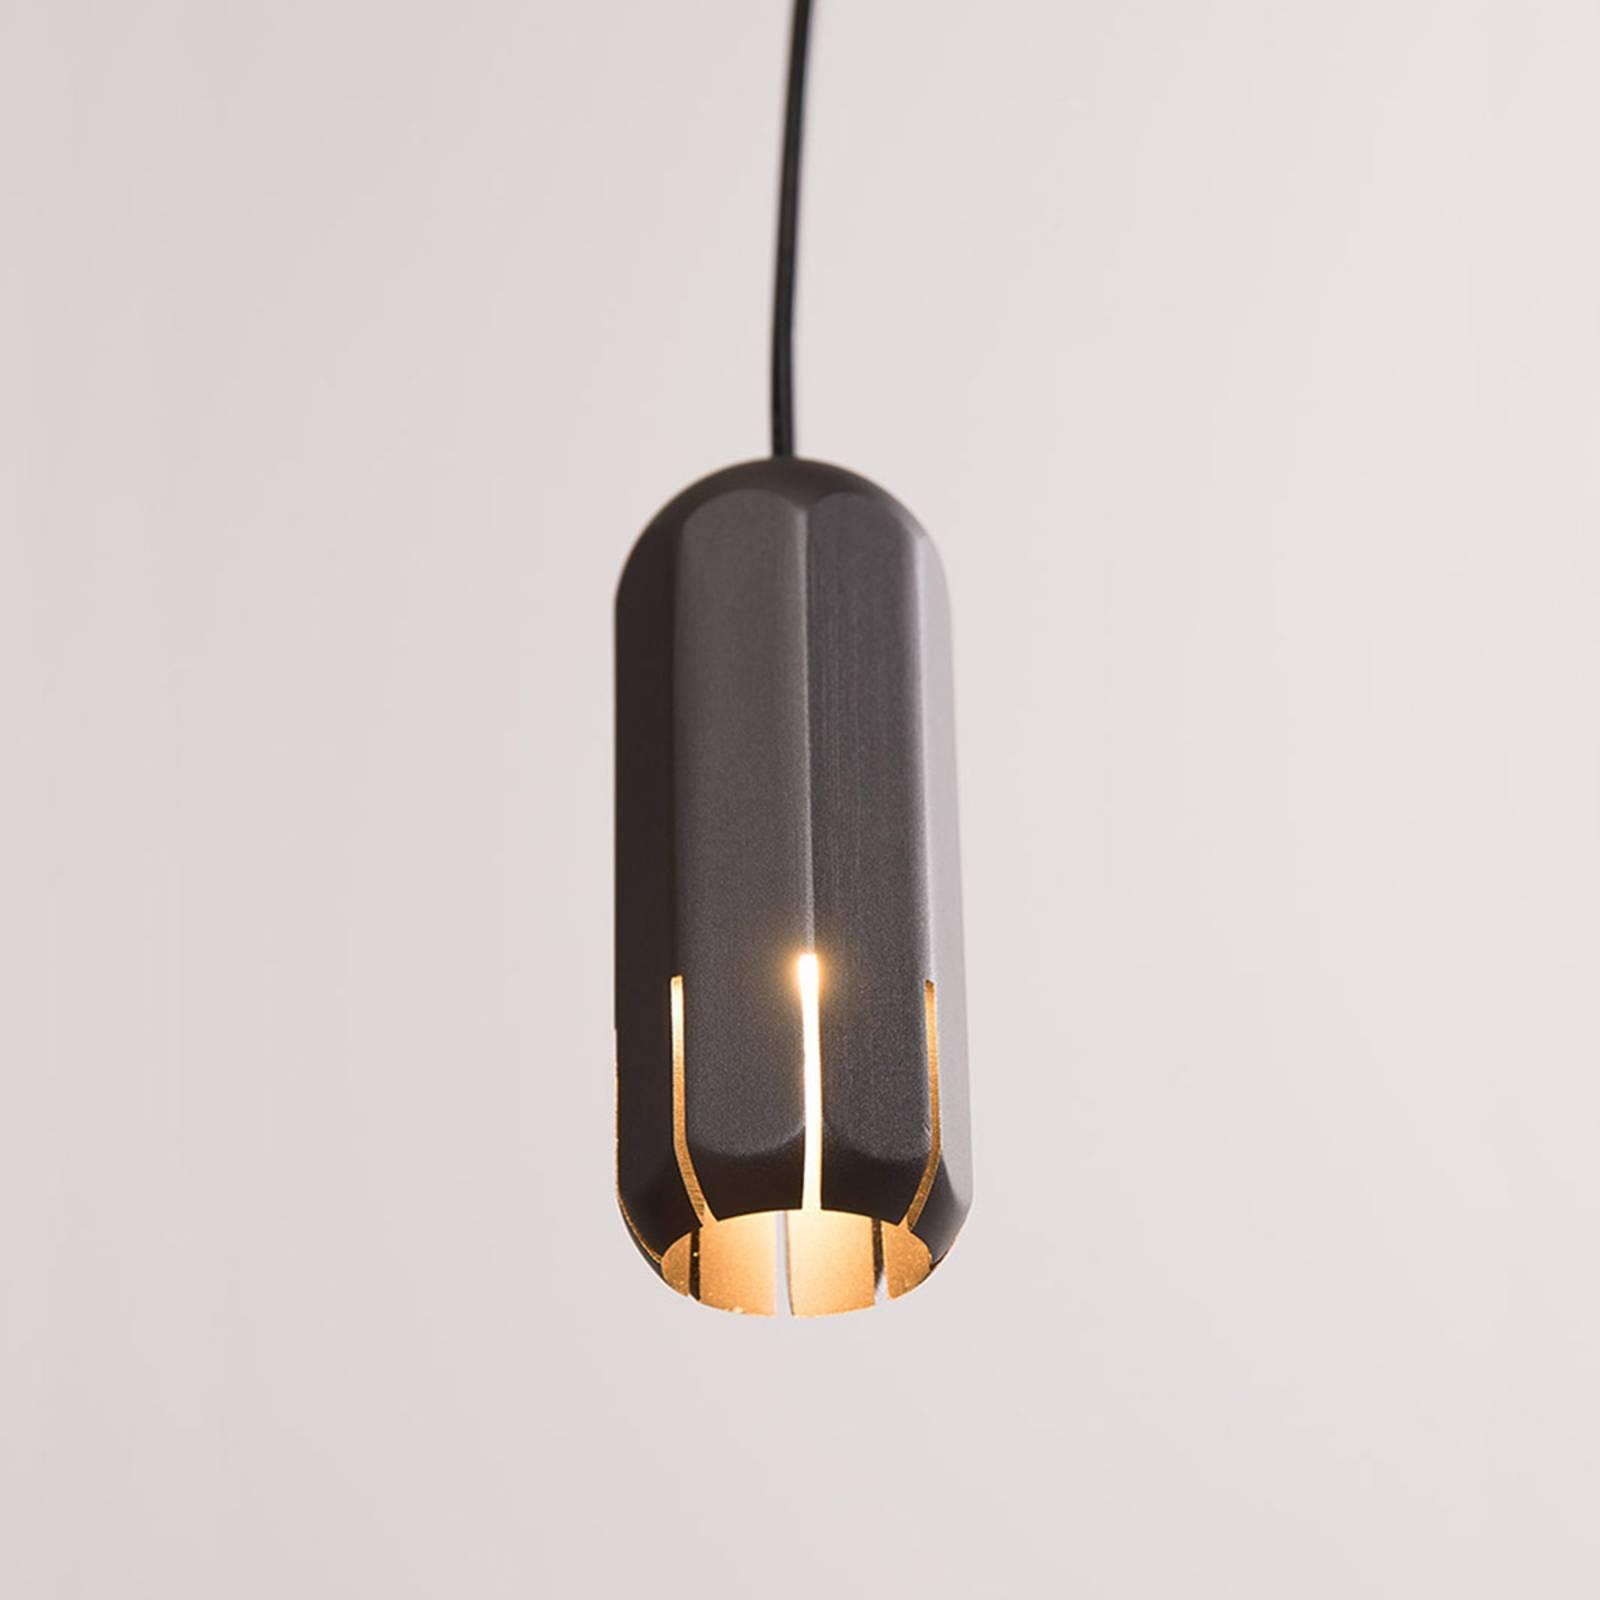 Innermost Brixton spot 11 LED hanglamp grafiet